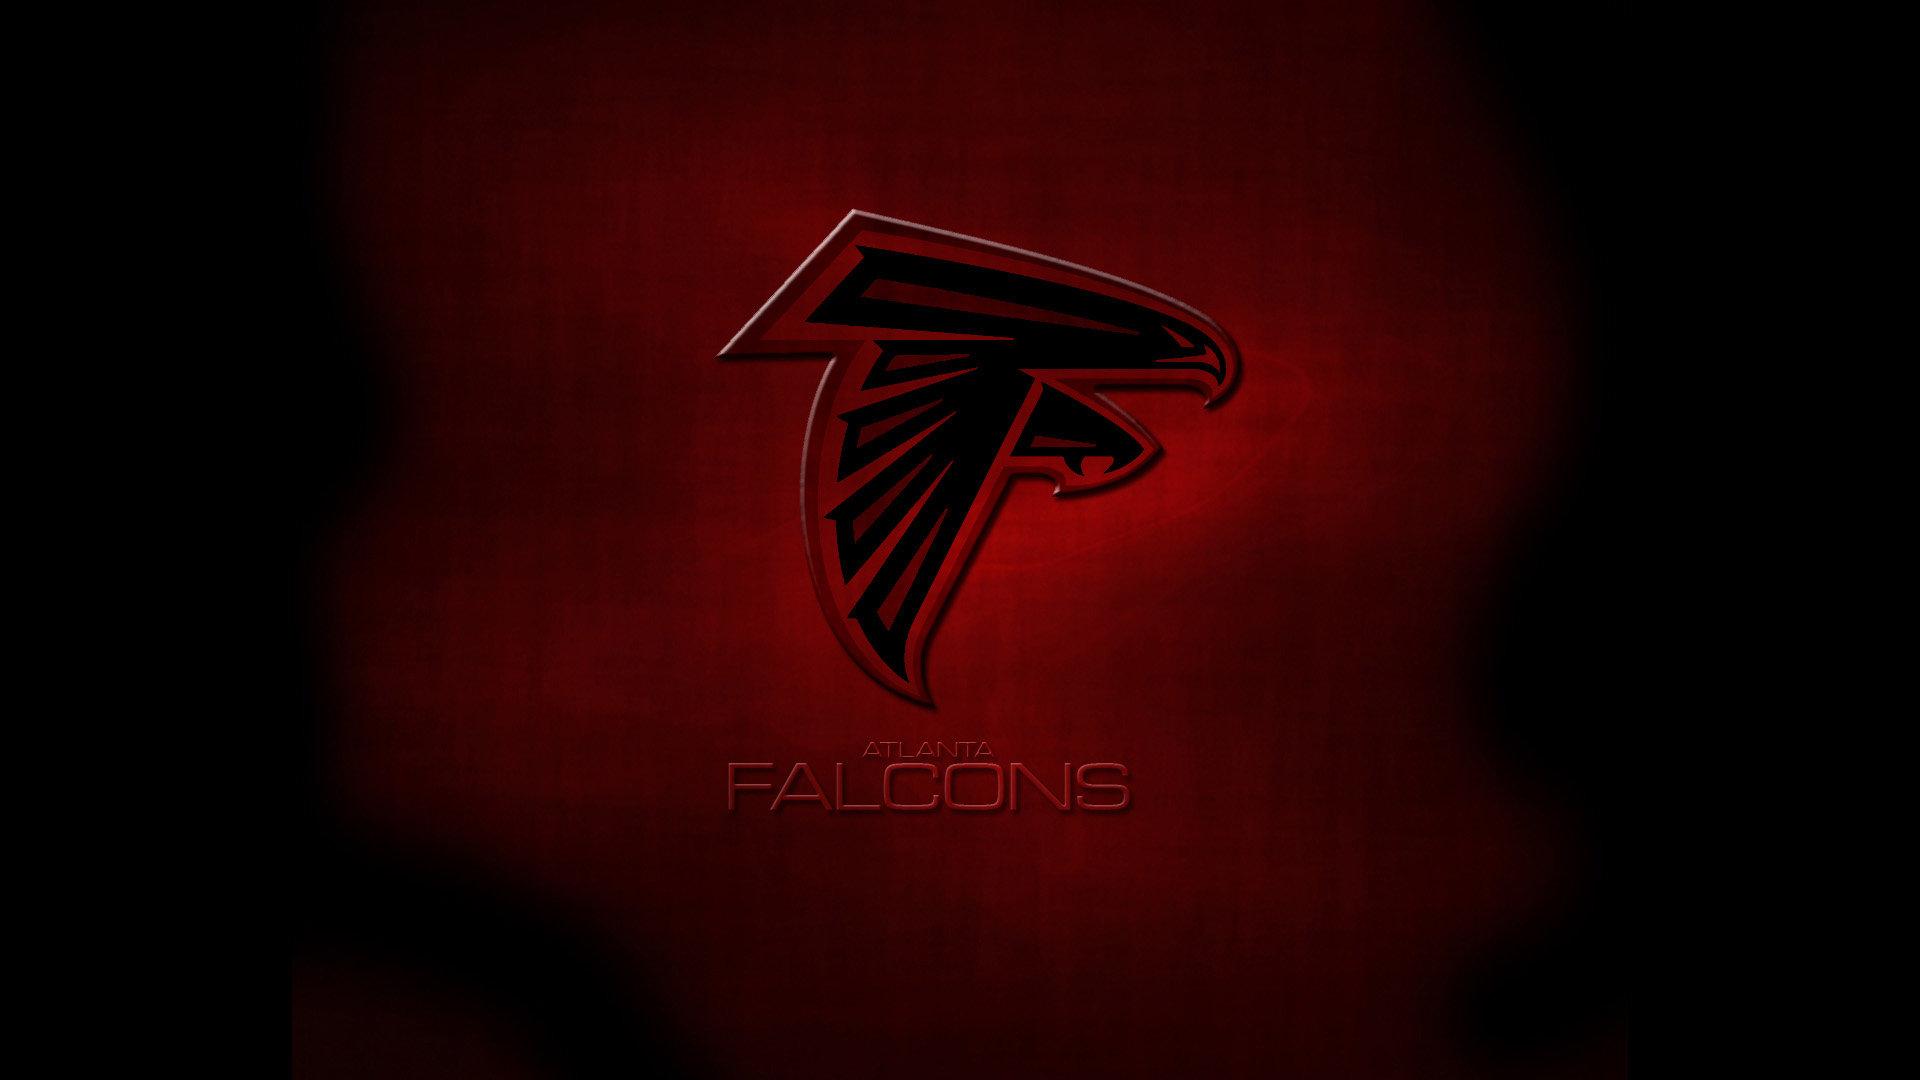 Atlanta Falcons HD Backgrounds For 1920x1080 Full 1080p Desktop